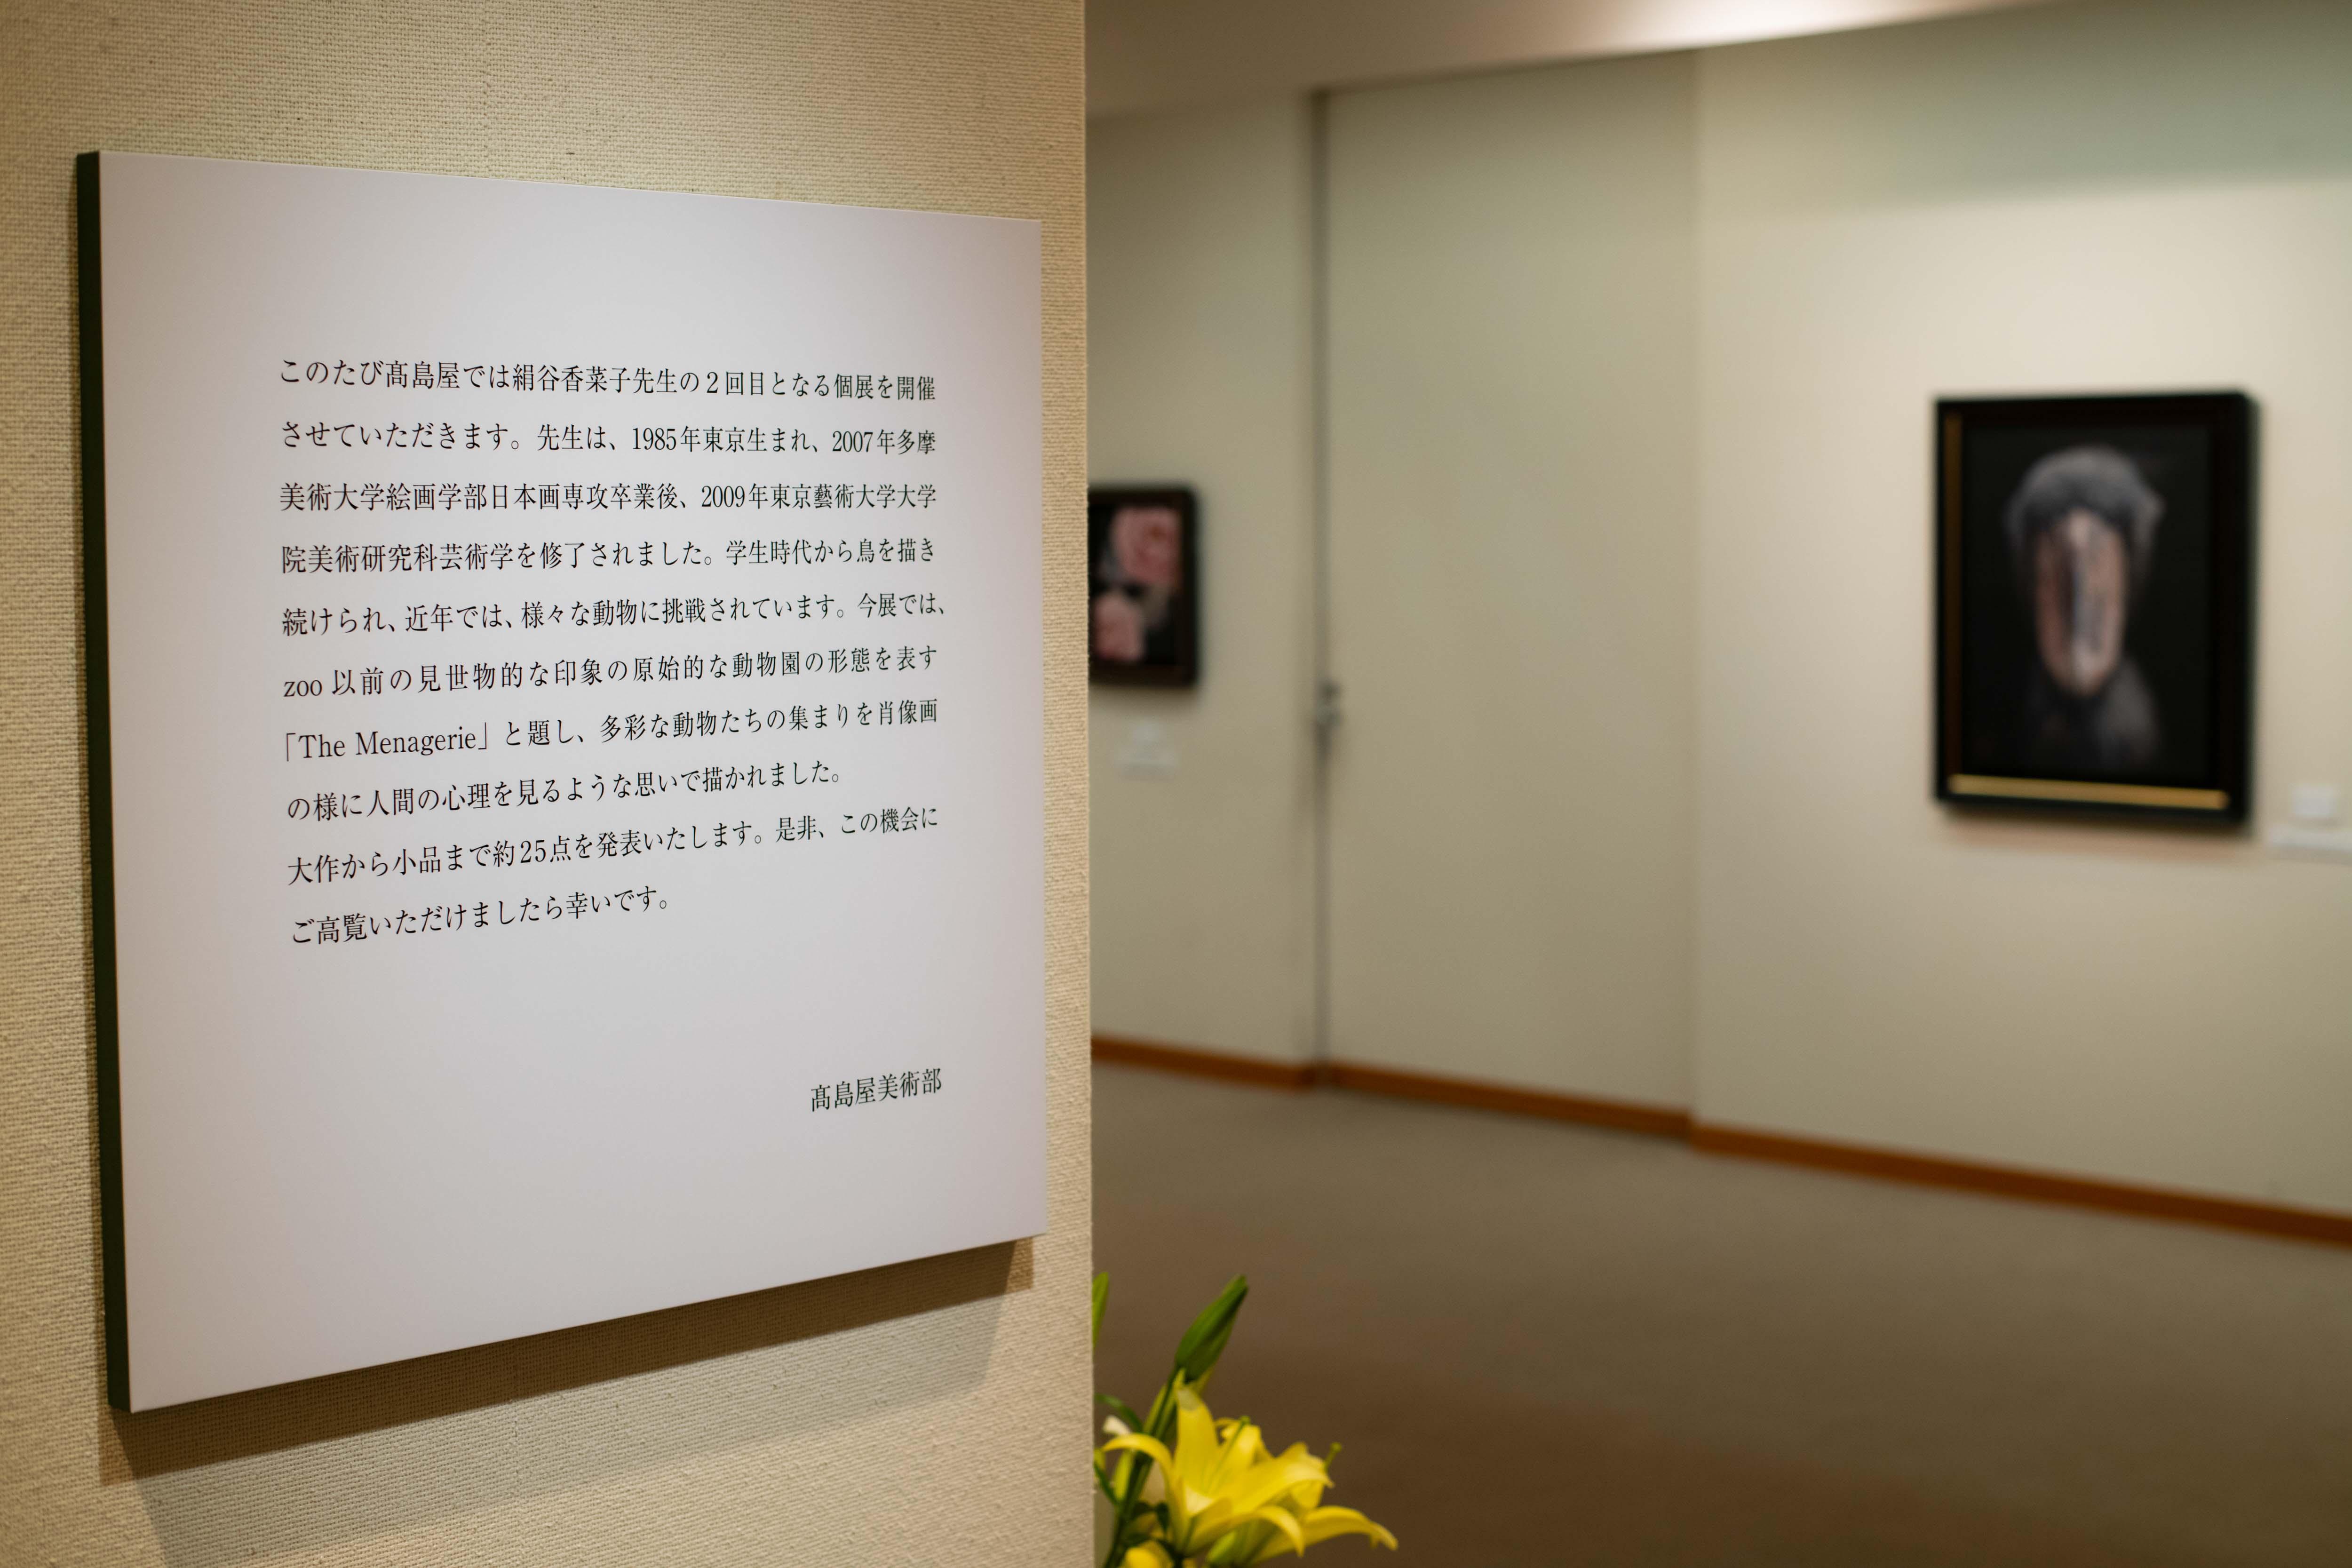 https://kanakokinutani.com/exhibition/image/S20201007-105.jpg